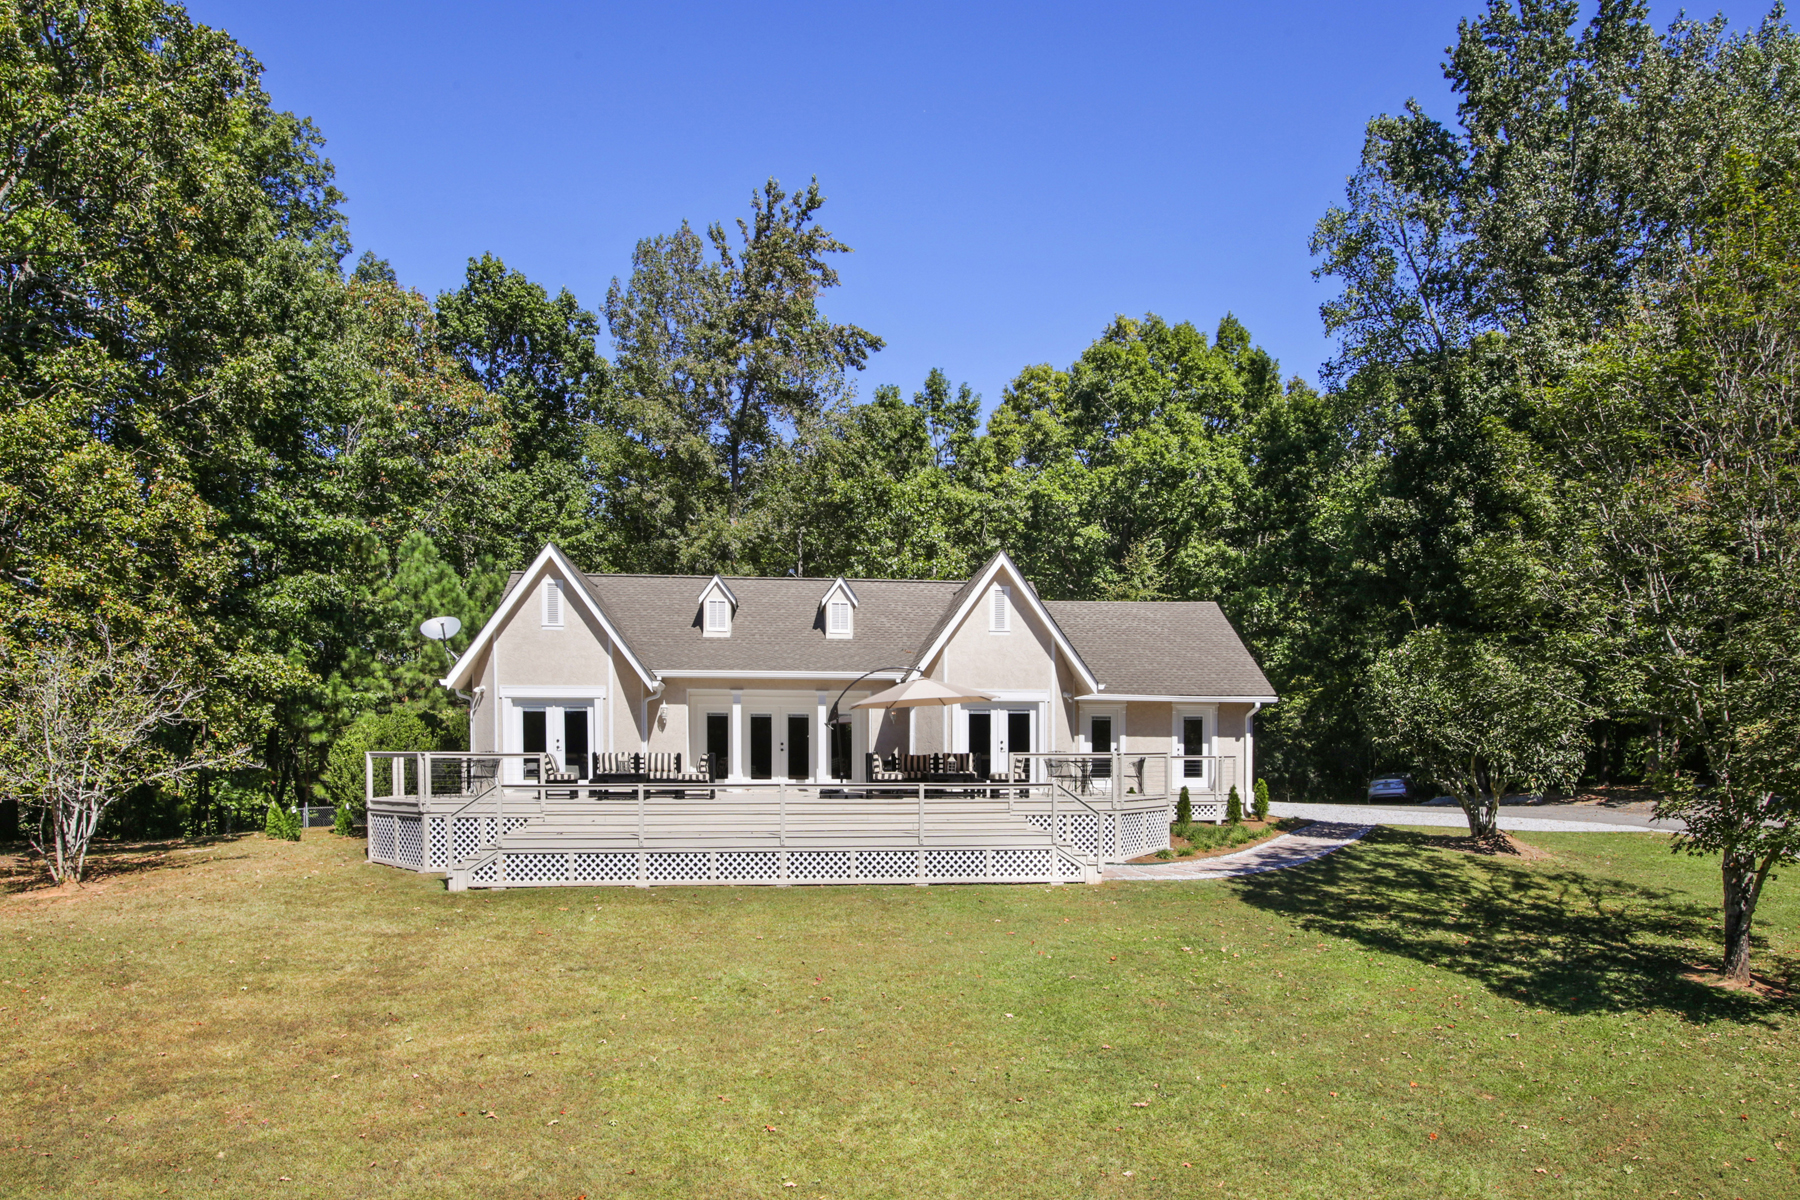 独户住宅 为 销售 在 European Style Lakefront Getaway 8440 Hearn Road 查特胡奇, 乔治亚州, 30268 美国